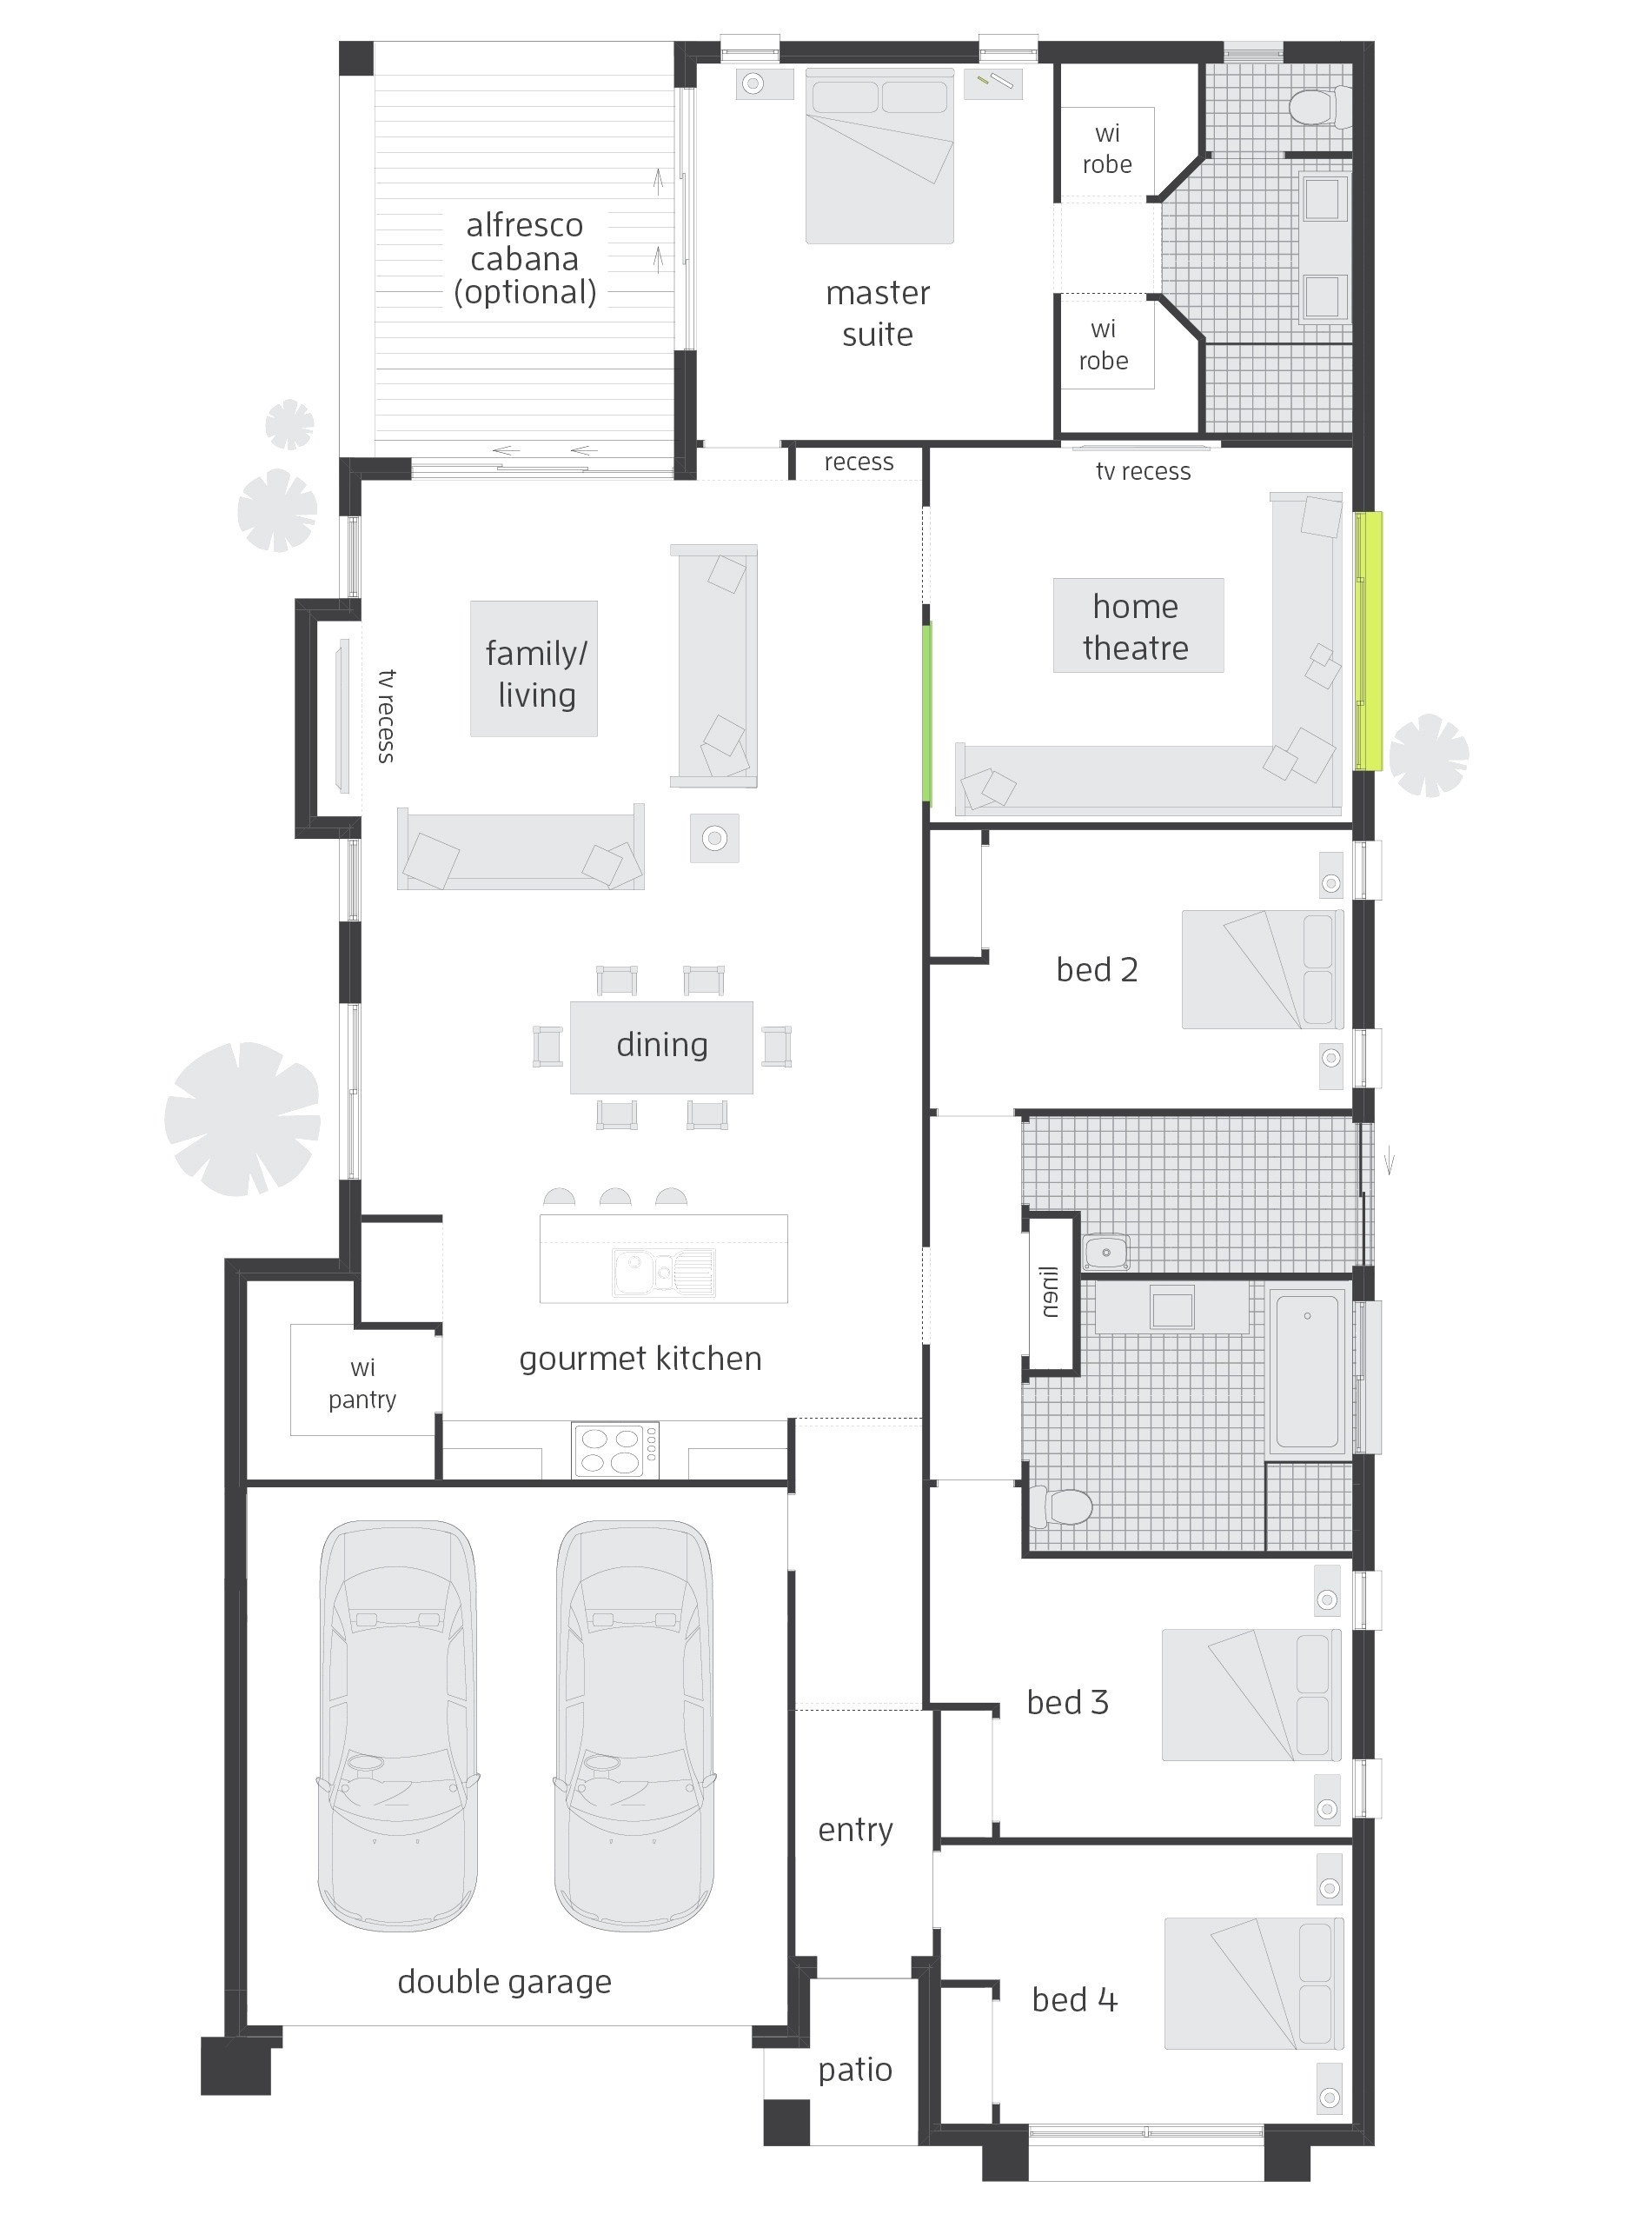 ryan homes strauss model floor plan elegant 20 new ryan homes strauss model floor plan